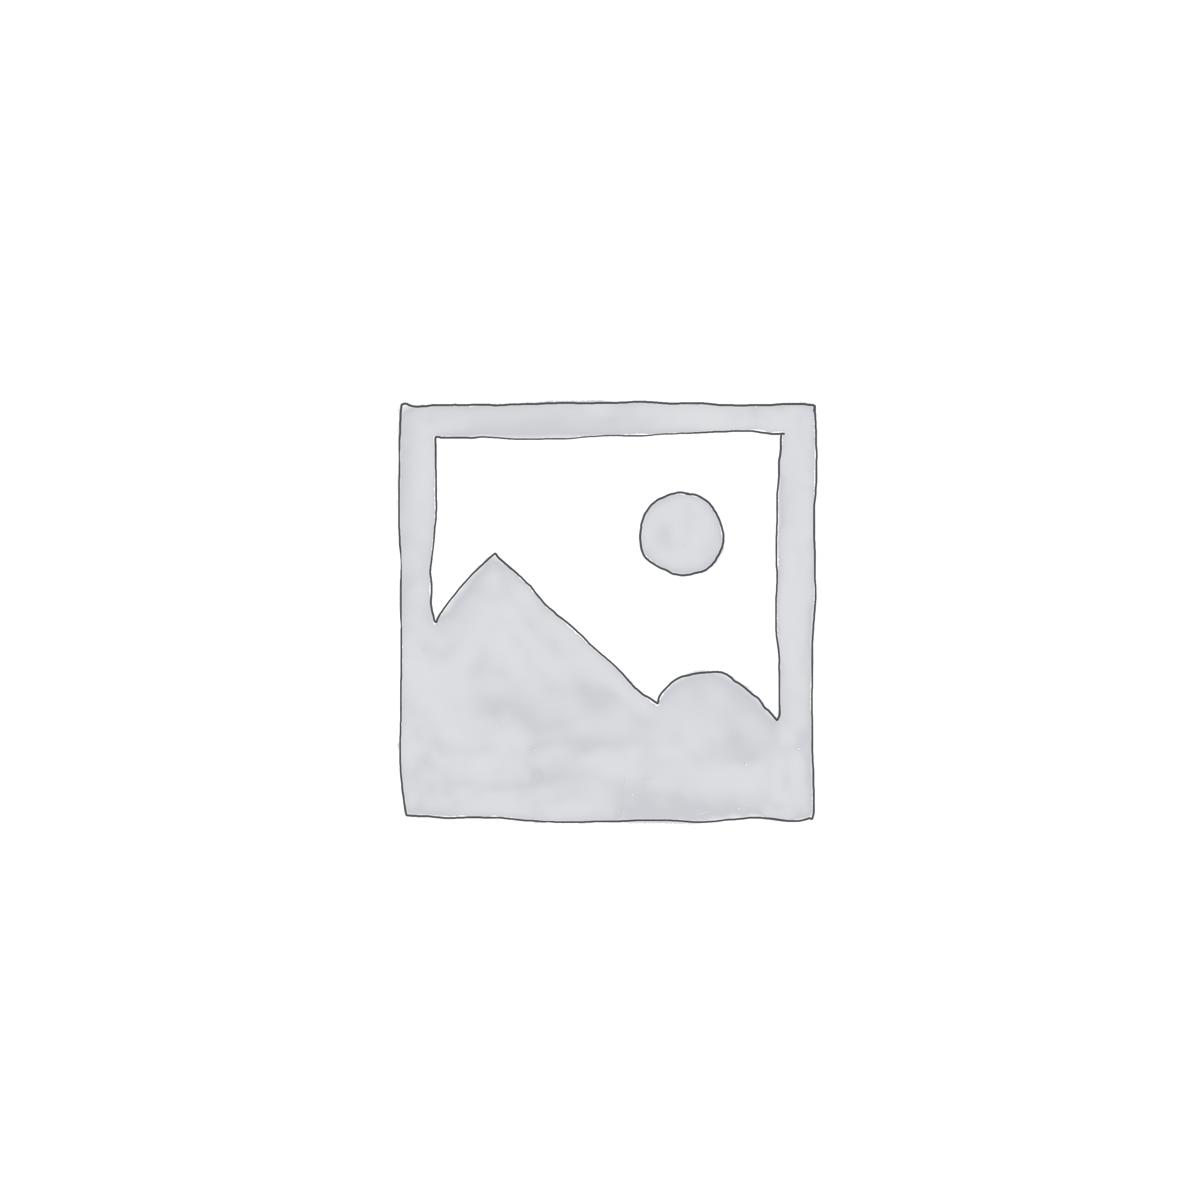 Historical Vintage Peacock Art Wallpaper Mural